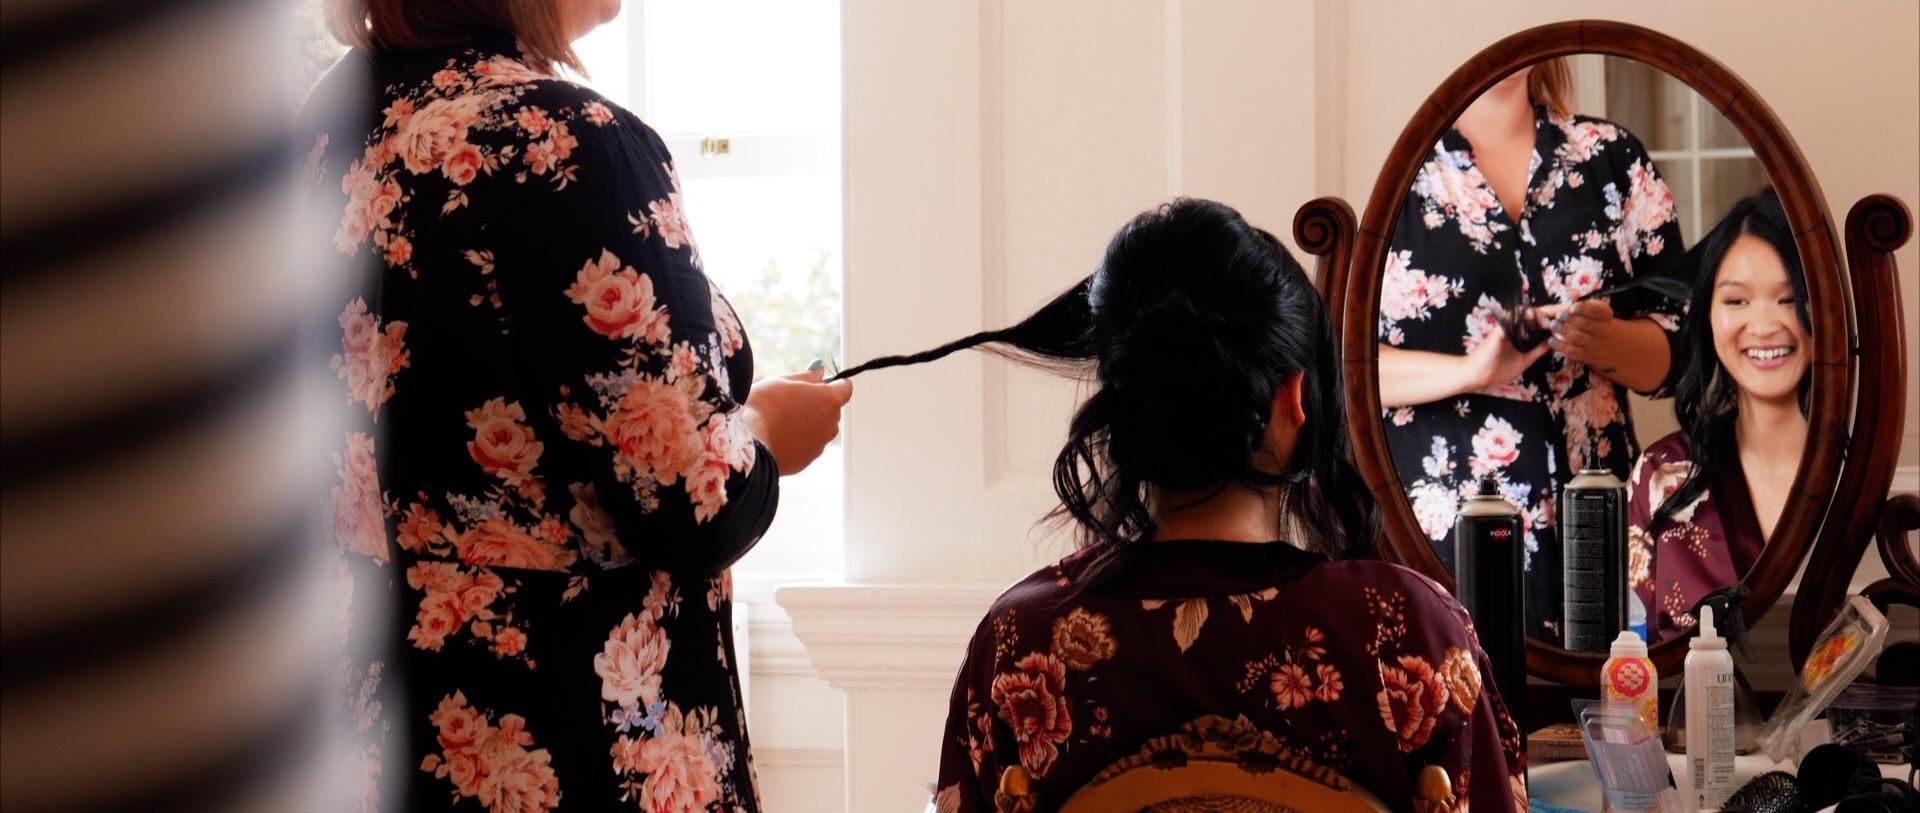 Bridal preparations at Boreham House